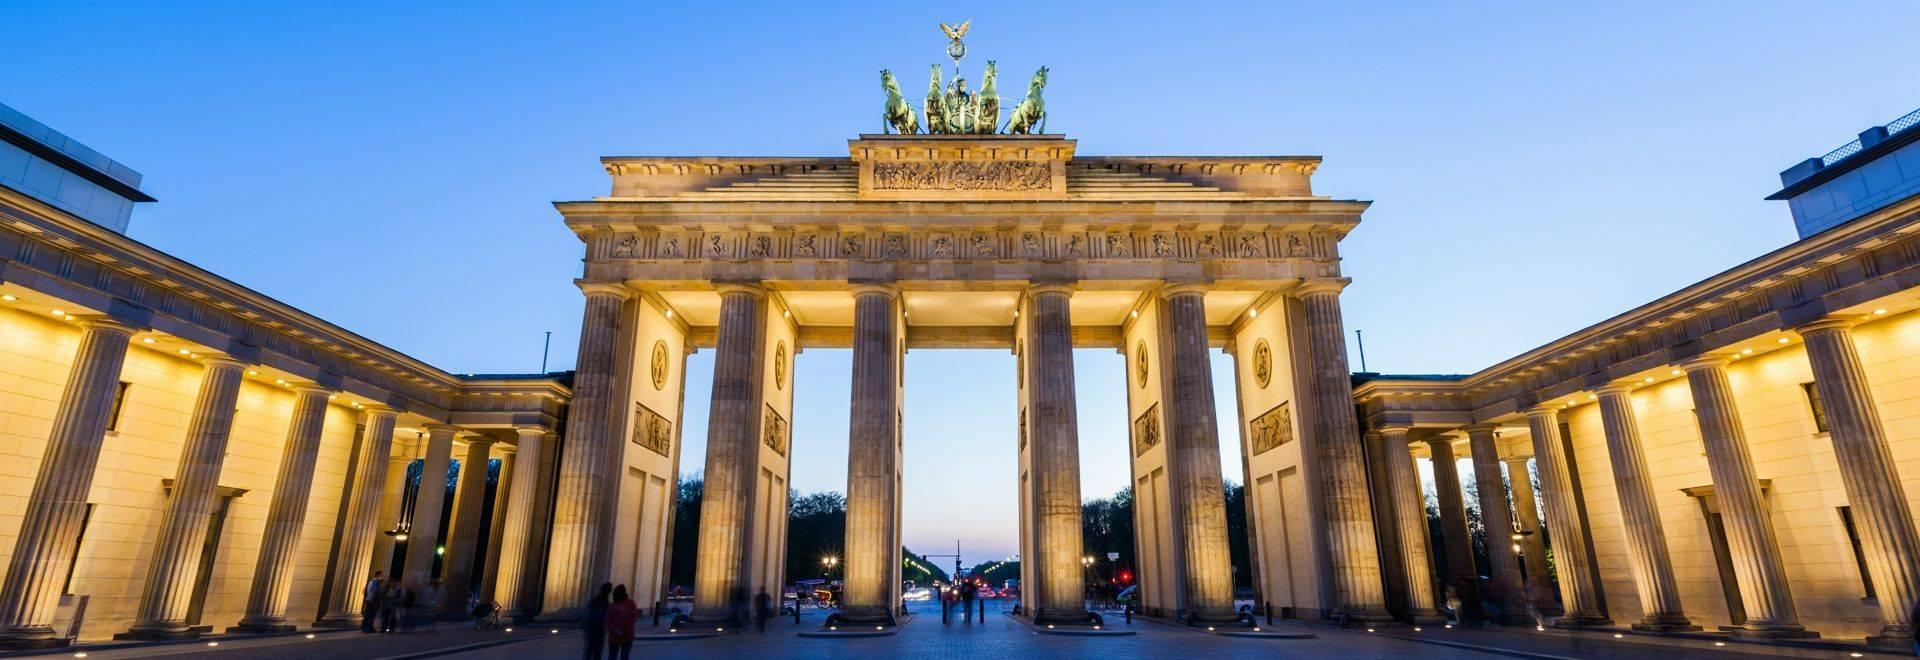 Shutterstock 248274001 Brandenburg Gate